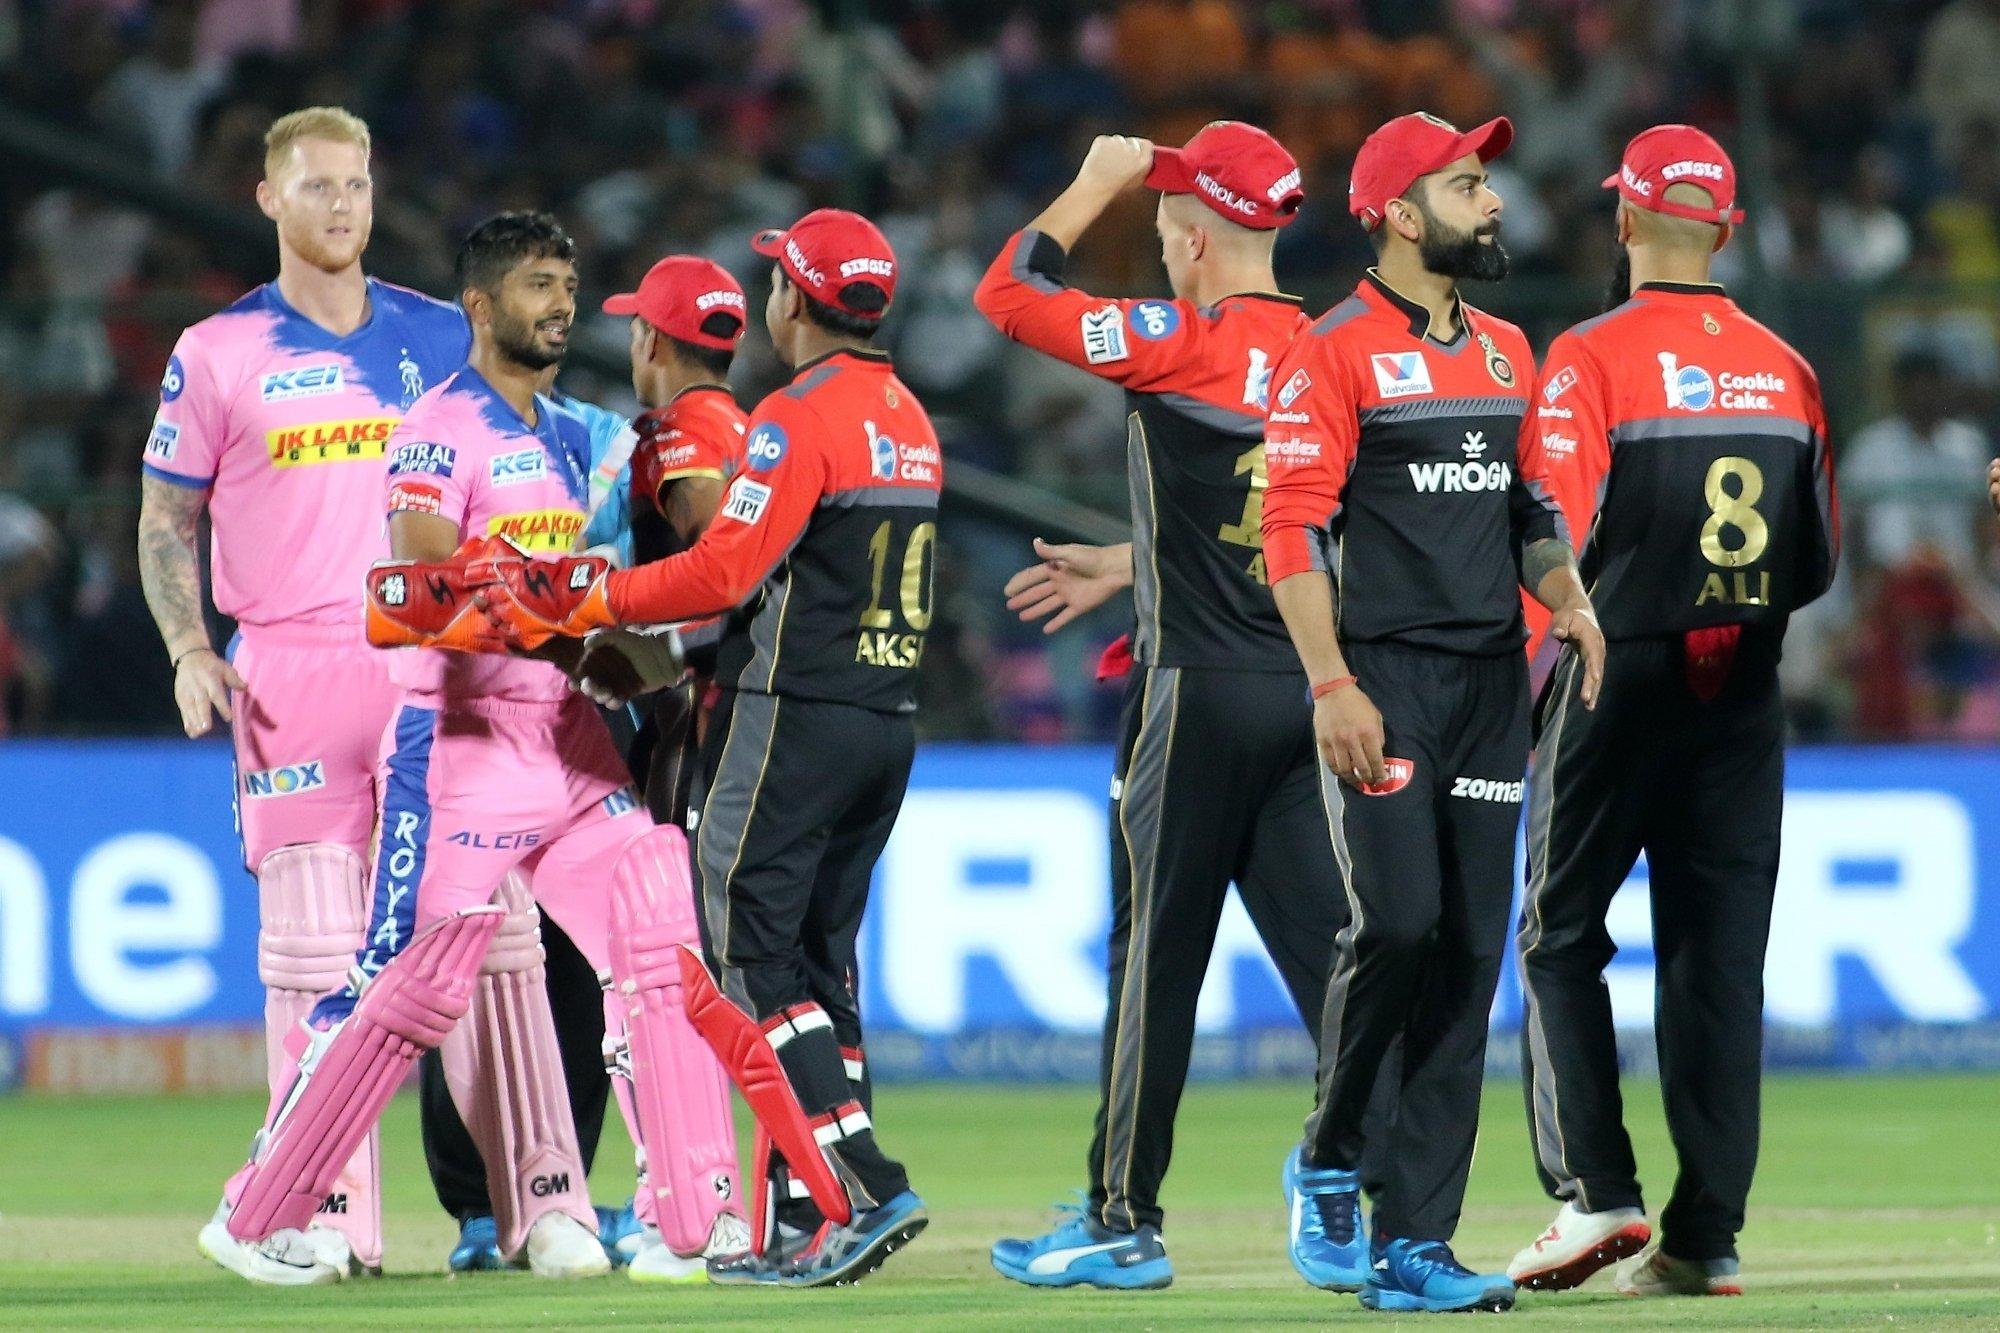 Jaipur: Rajasthan Royals' Ben Stokes and Rahul Tripathi celebrate after wining the 14th IPL 2019 match against Royal Challengers Bangalore at Sawai Mansingh Stadium in Jaipur on April 2, 2019. (Photo: IANS)